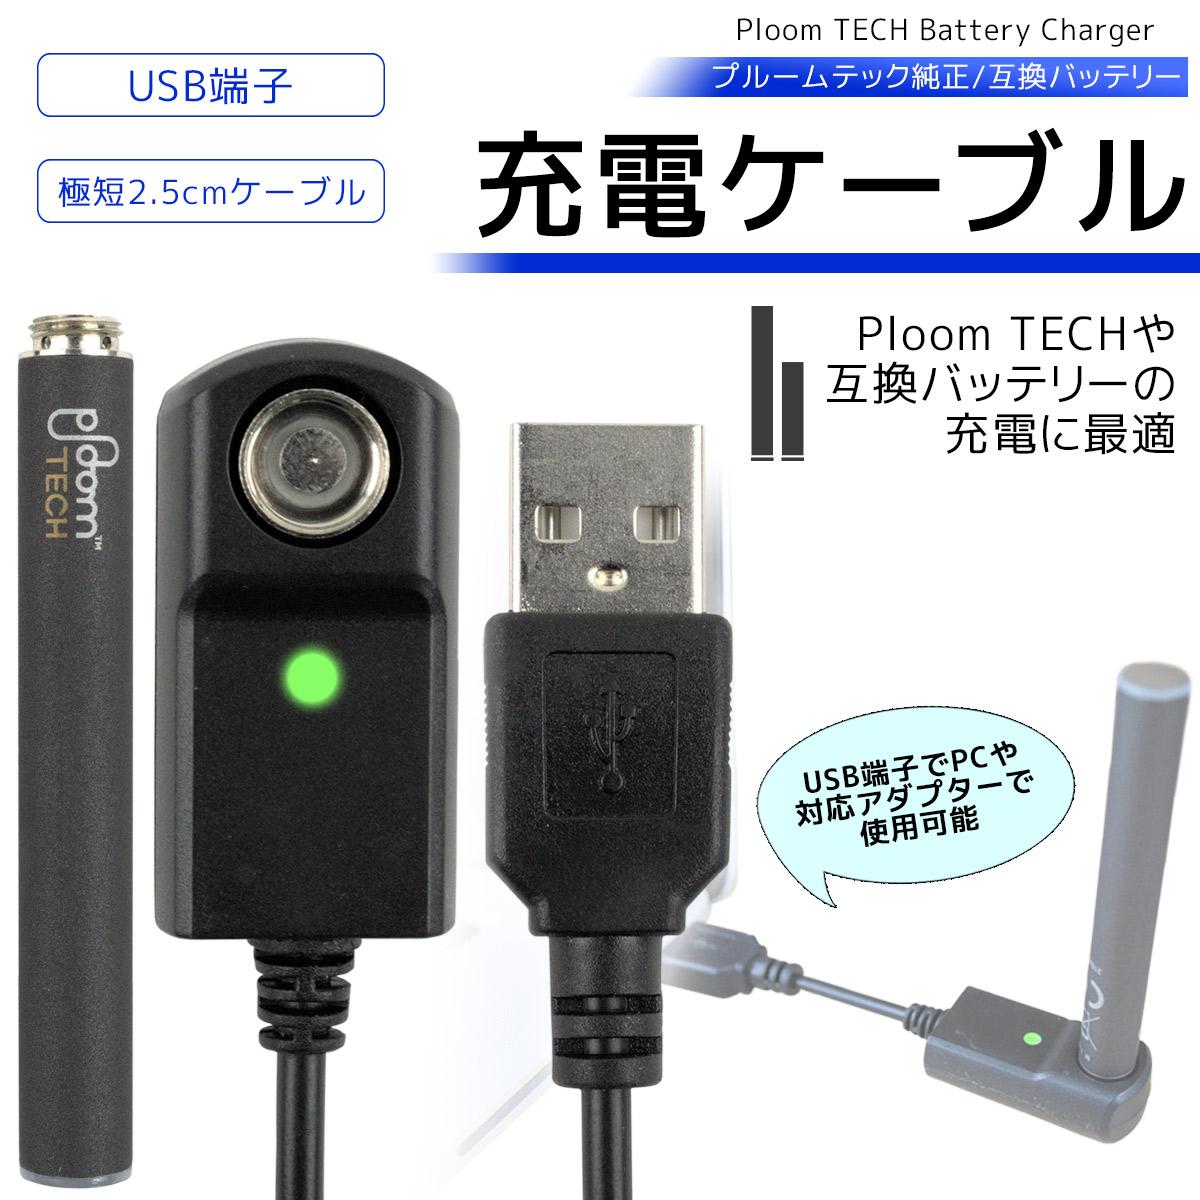 PloomTECH互換USB充電コード